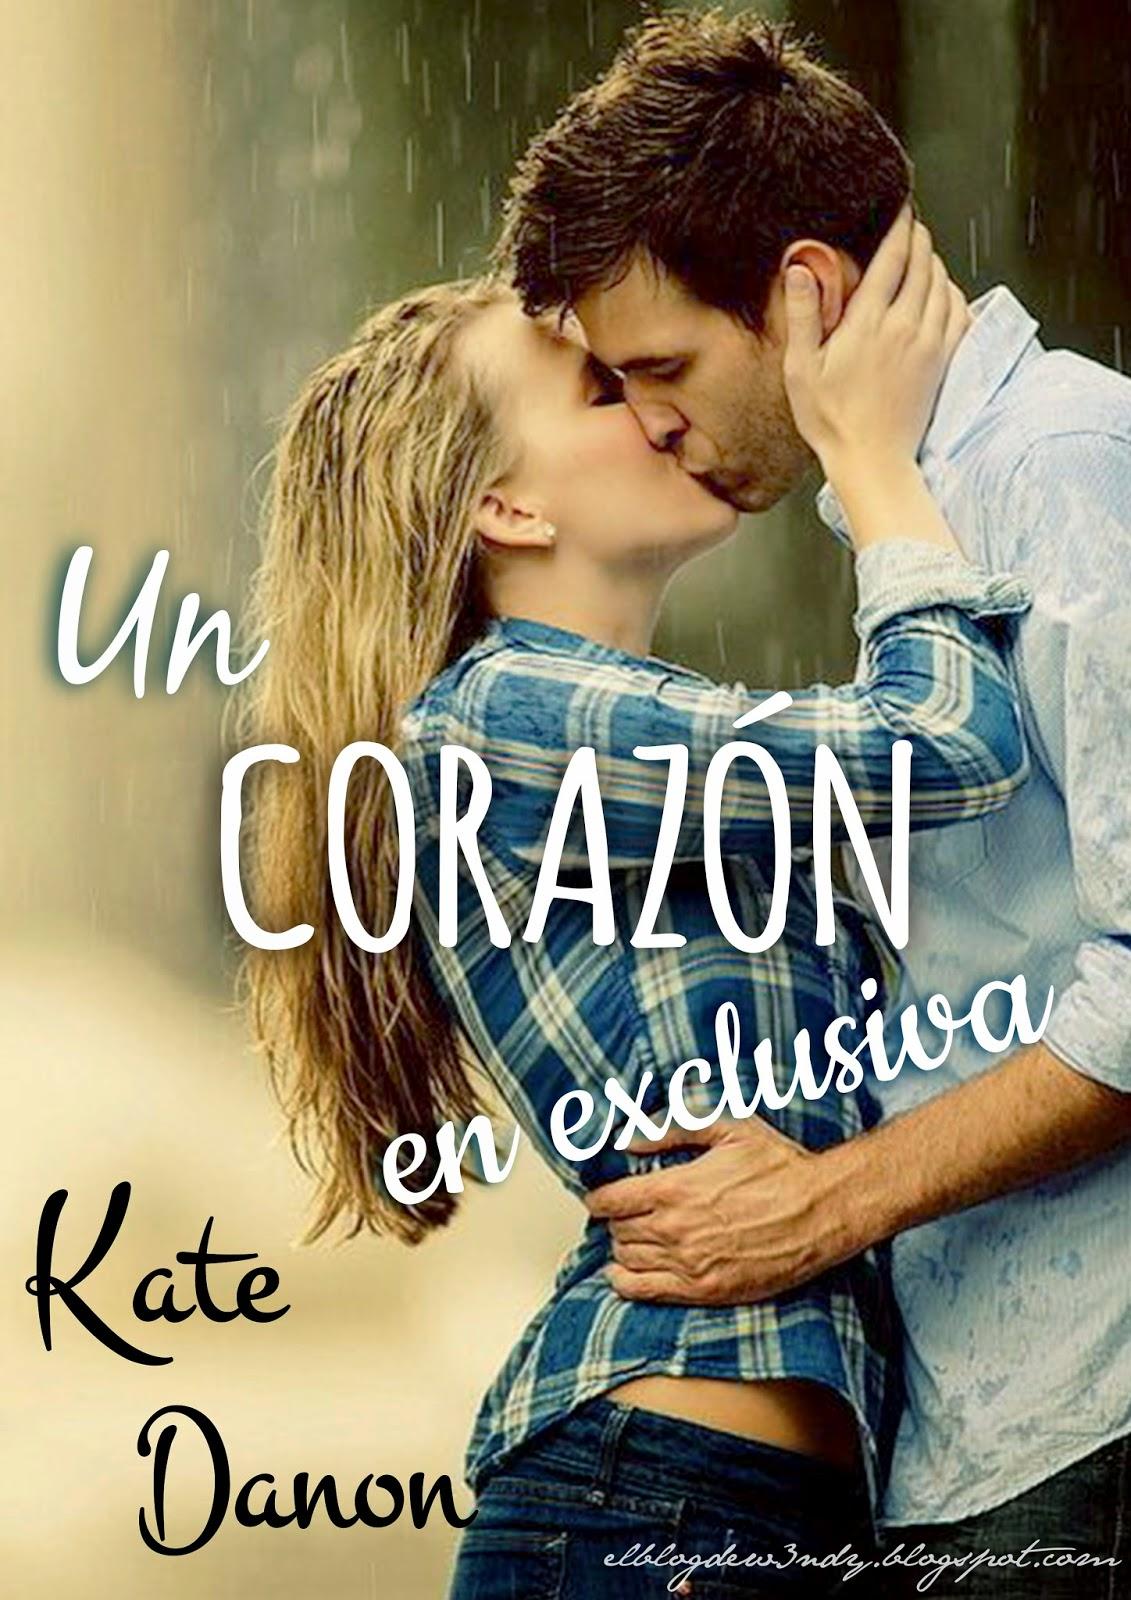 http://elblogdew3ndy.blogspot.com/2015/02/resena-un-corazon-en-exclusiva-kate.html